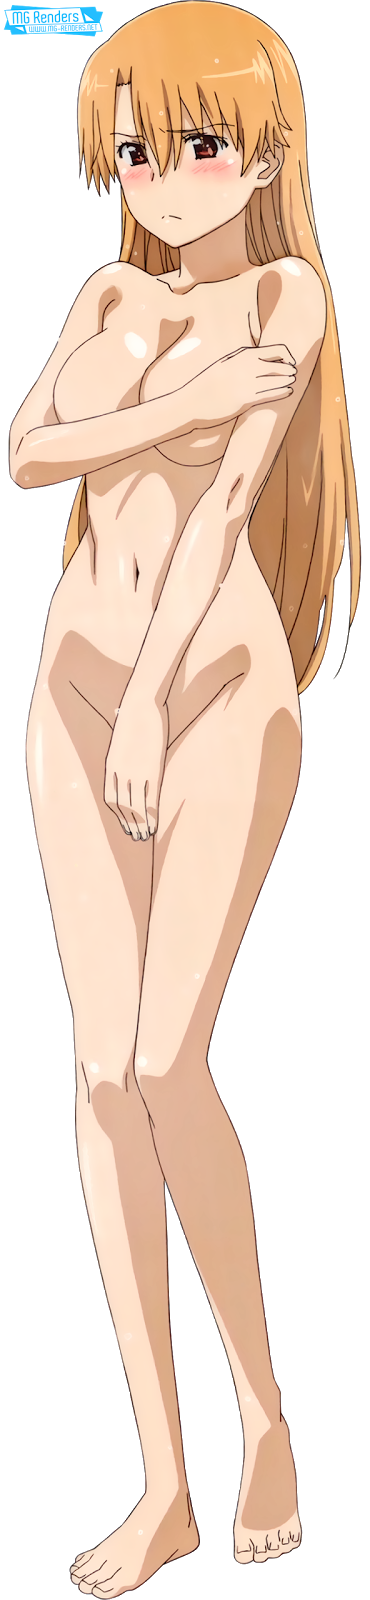 Tags: Anime, Render,  Feet,  Kiryuu Yuuzuki,  Kiss X Sis,  No bra,  Toes, PNG, Image, Picture